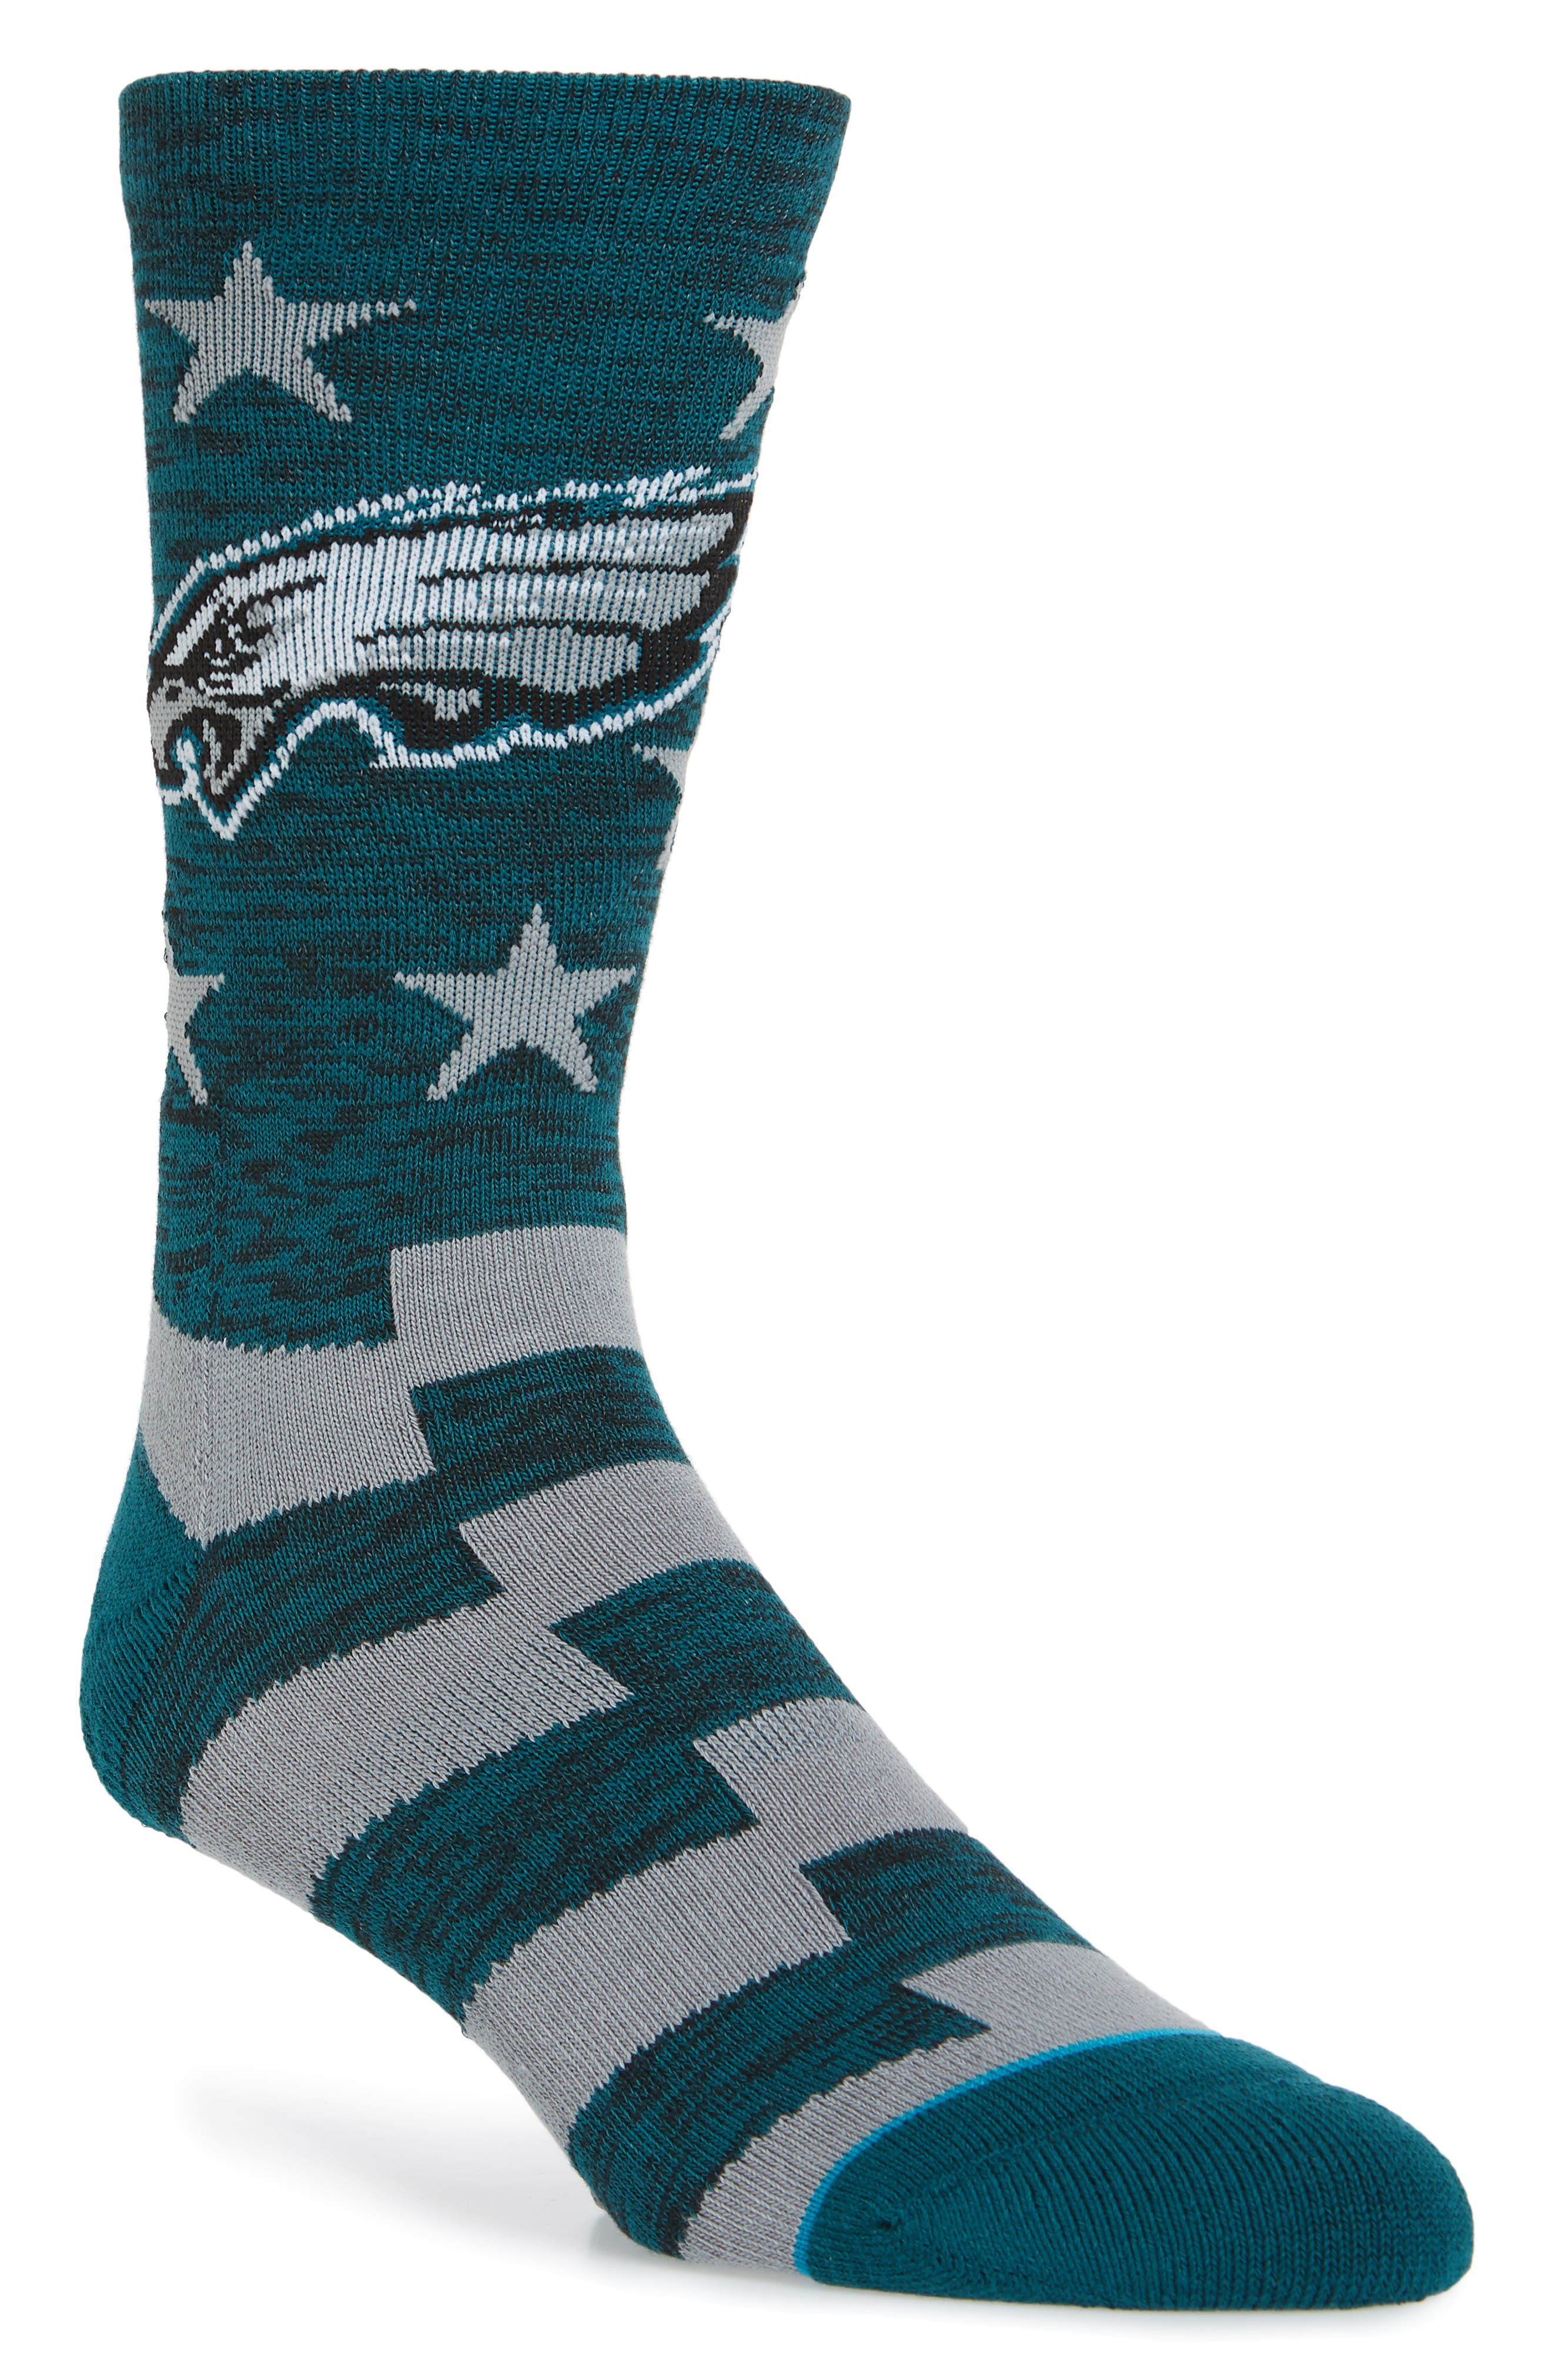 Philadelphia Eagles Banner Socks,                             Main thumbnail 1, color,                             020